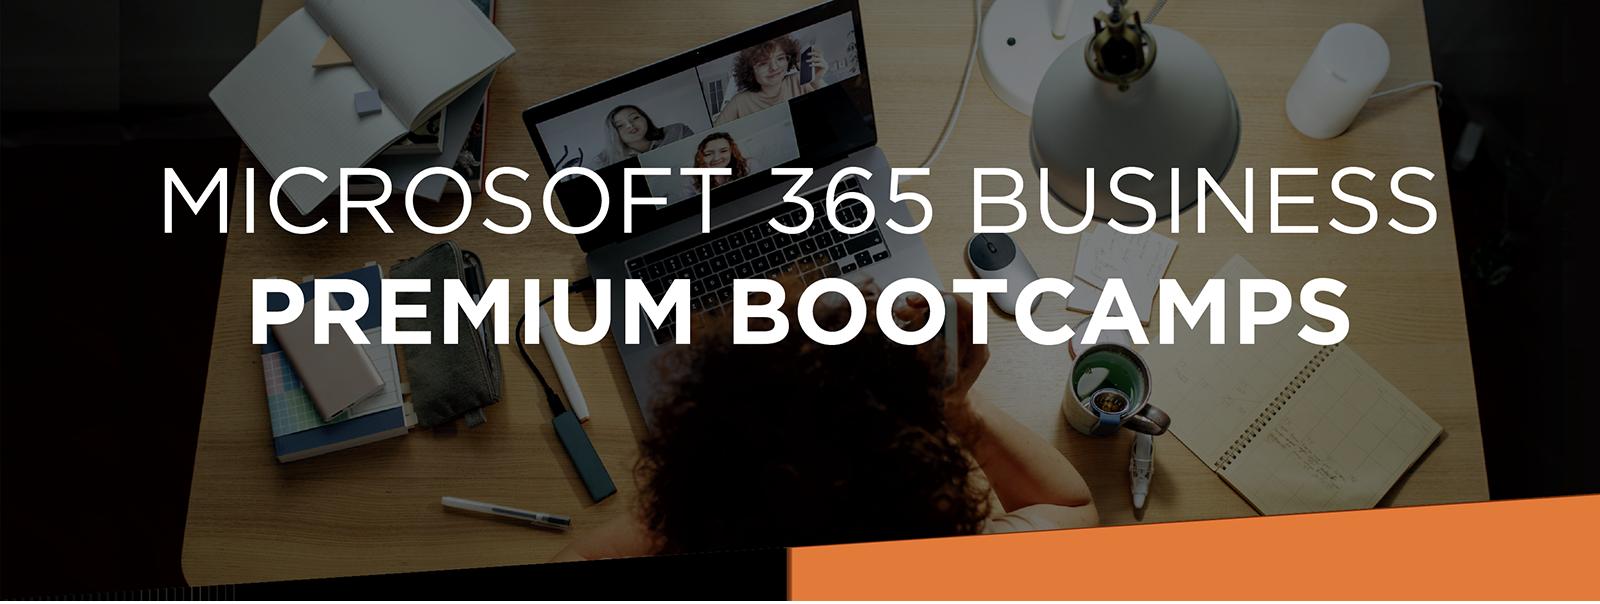 Business Premium Bootcamps